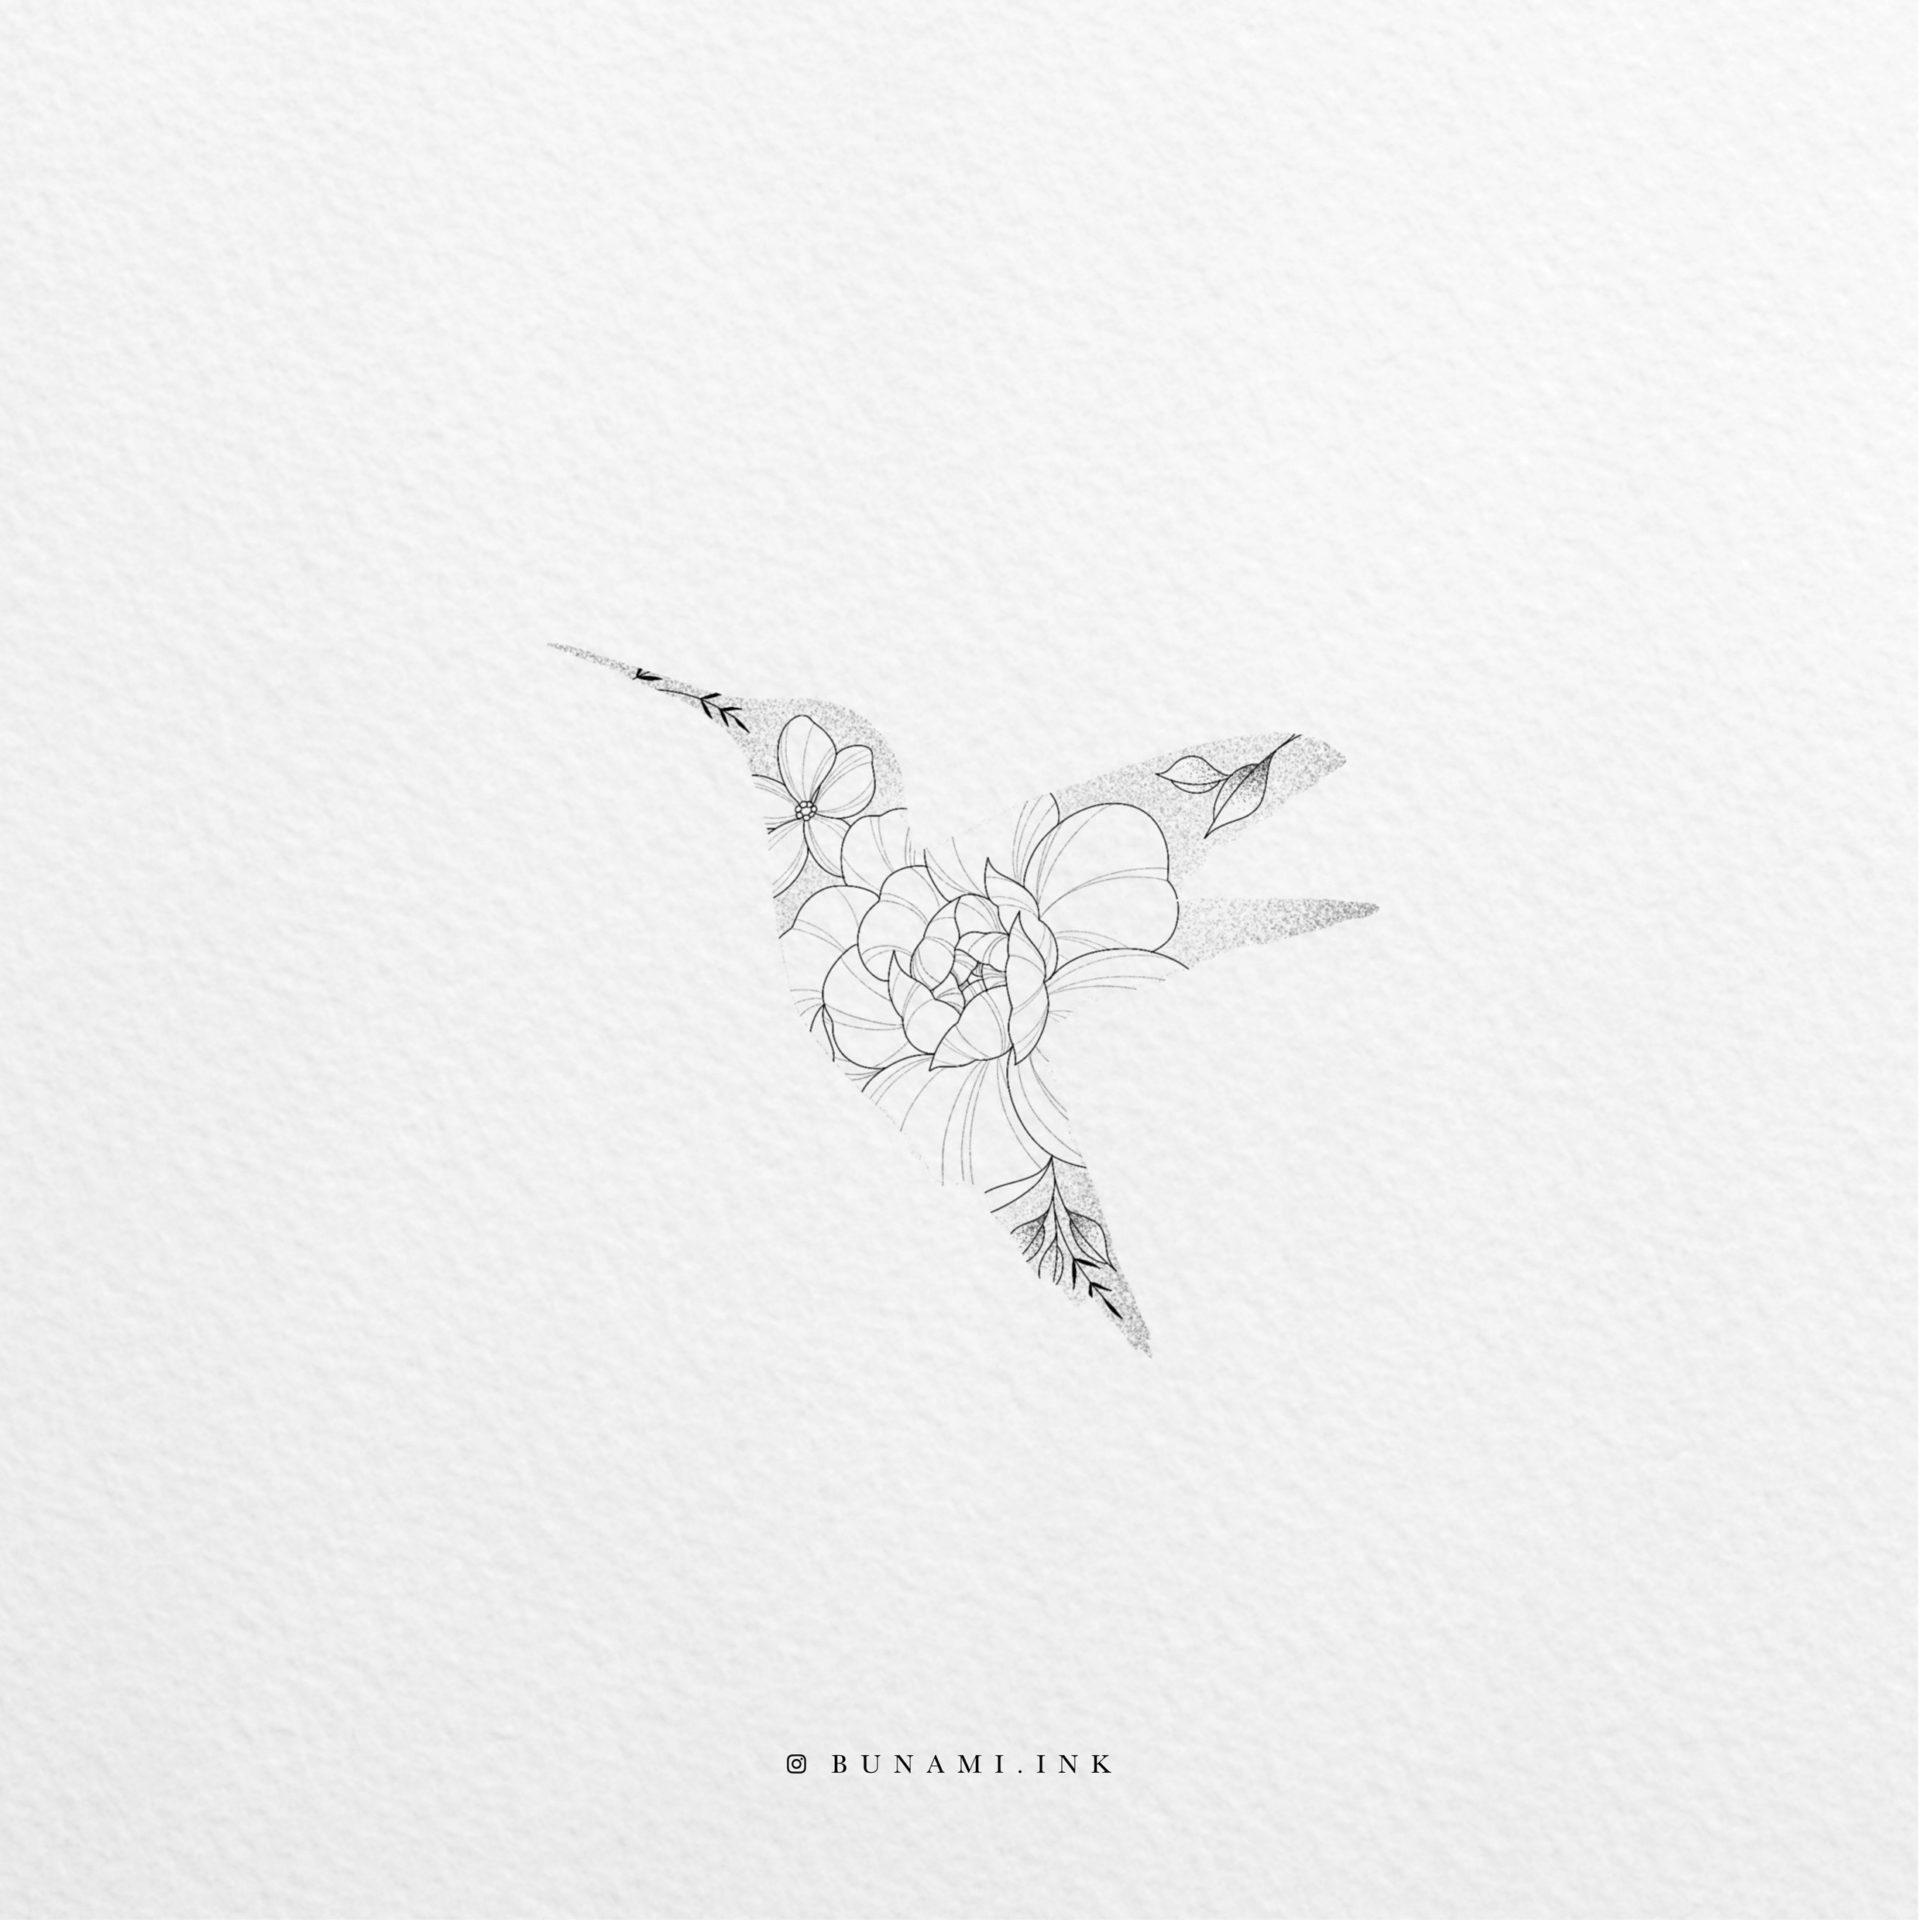 kolibri_2020-09-17